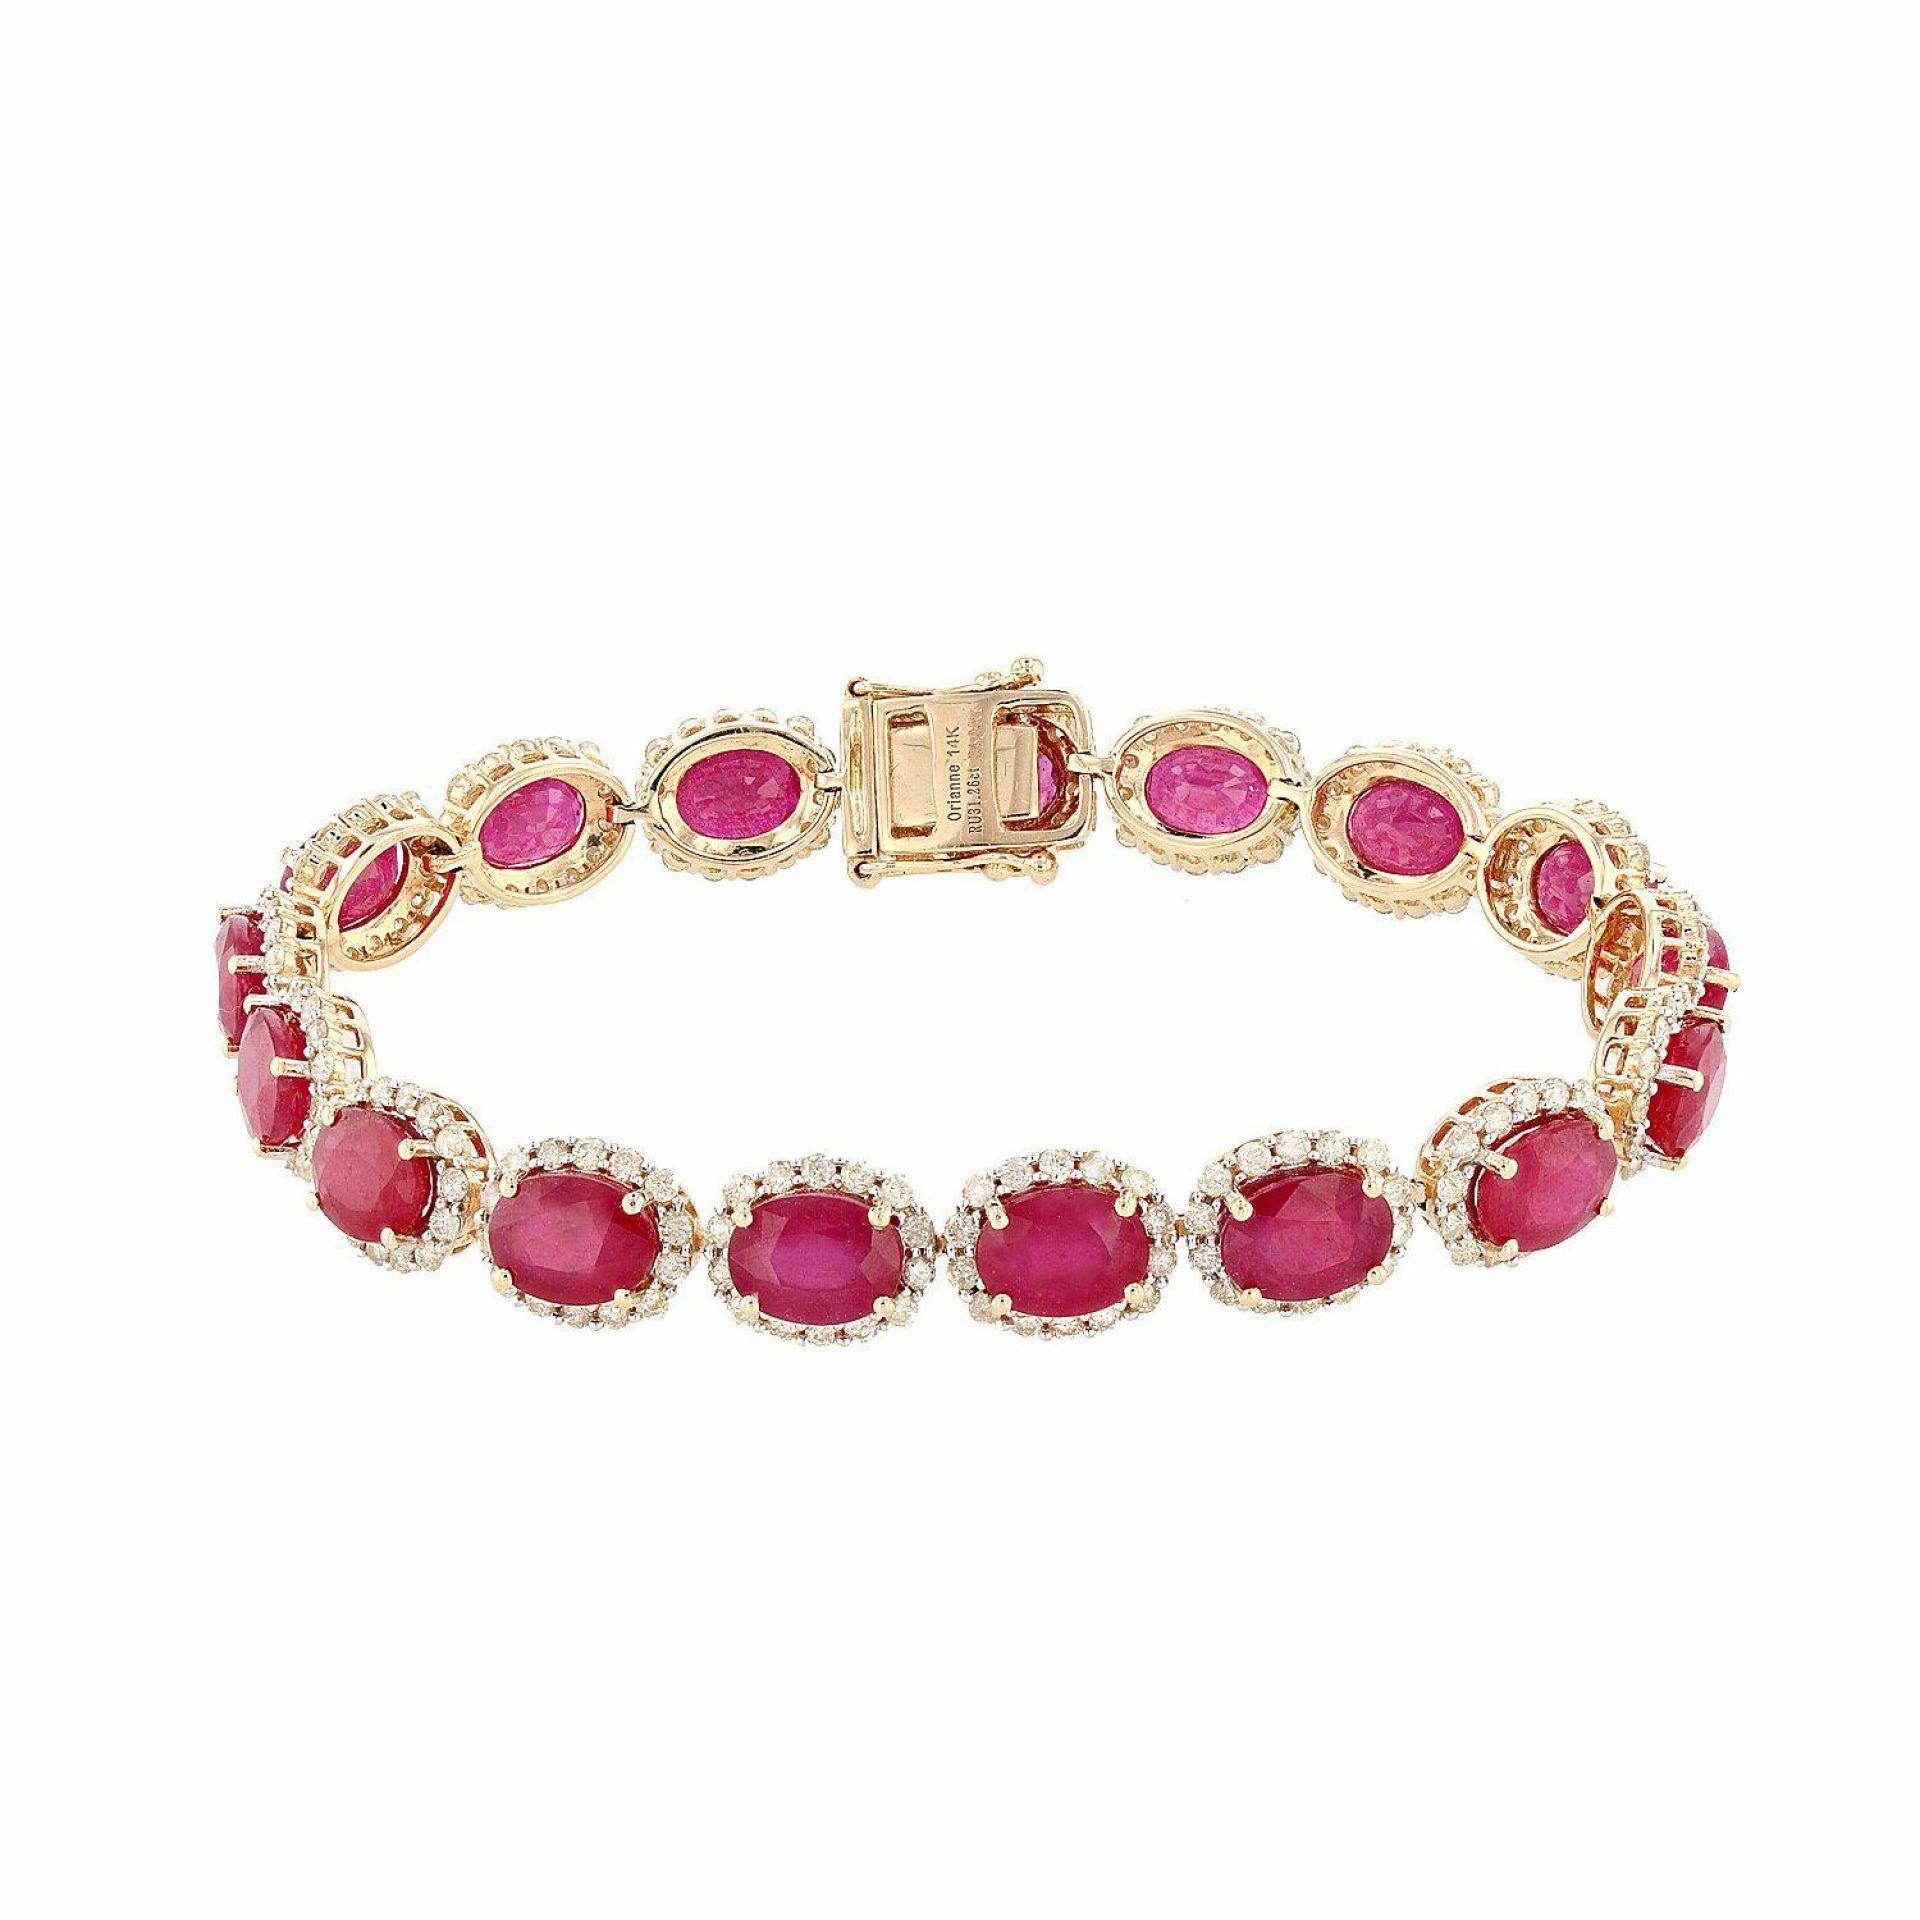 31.26ctw Ruby and 4.00ctw Diamond 14K Yellow Gold Bracelet